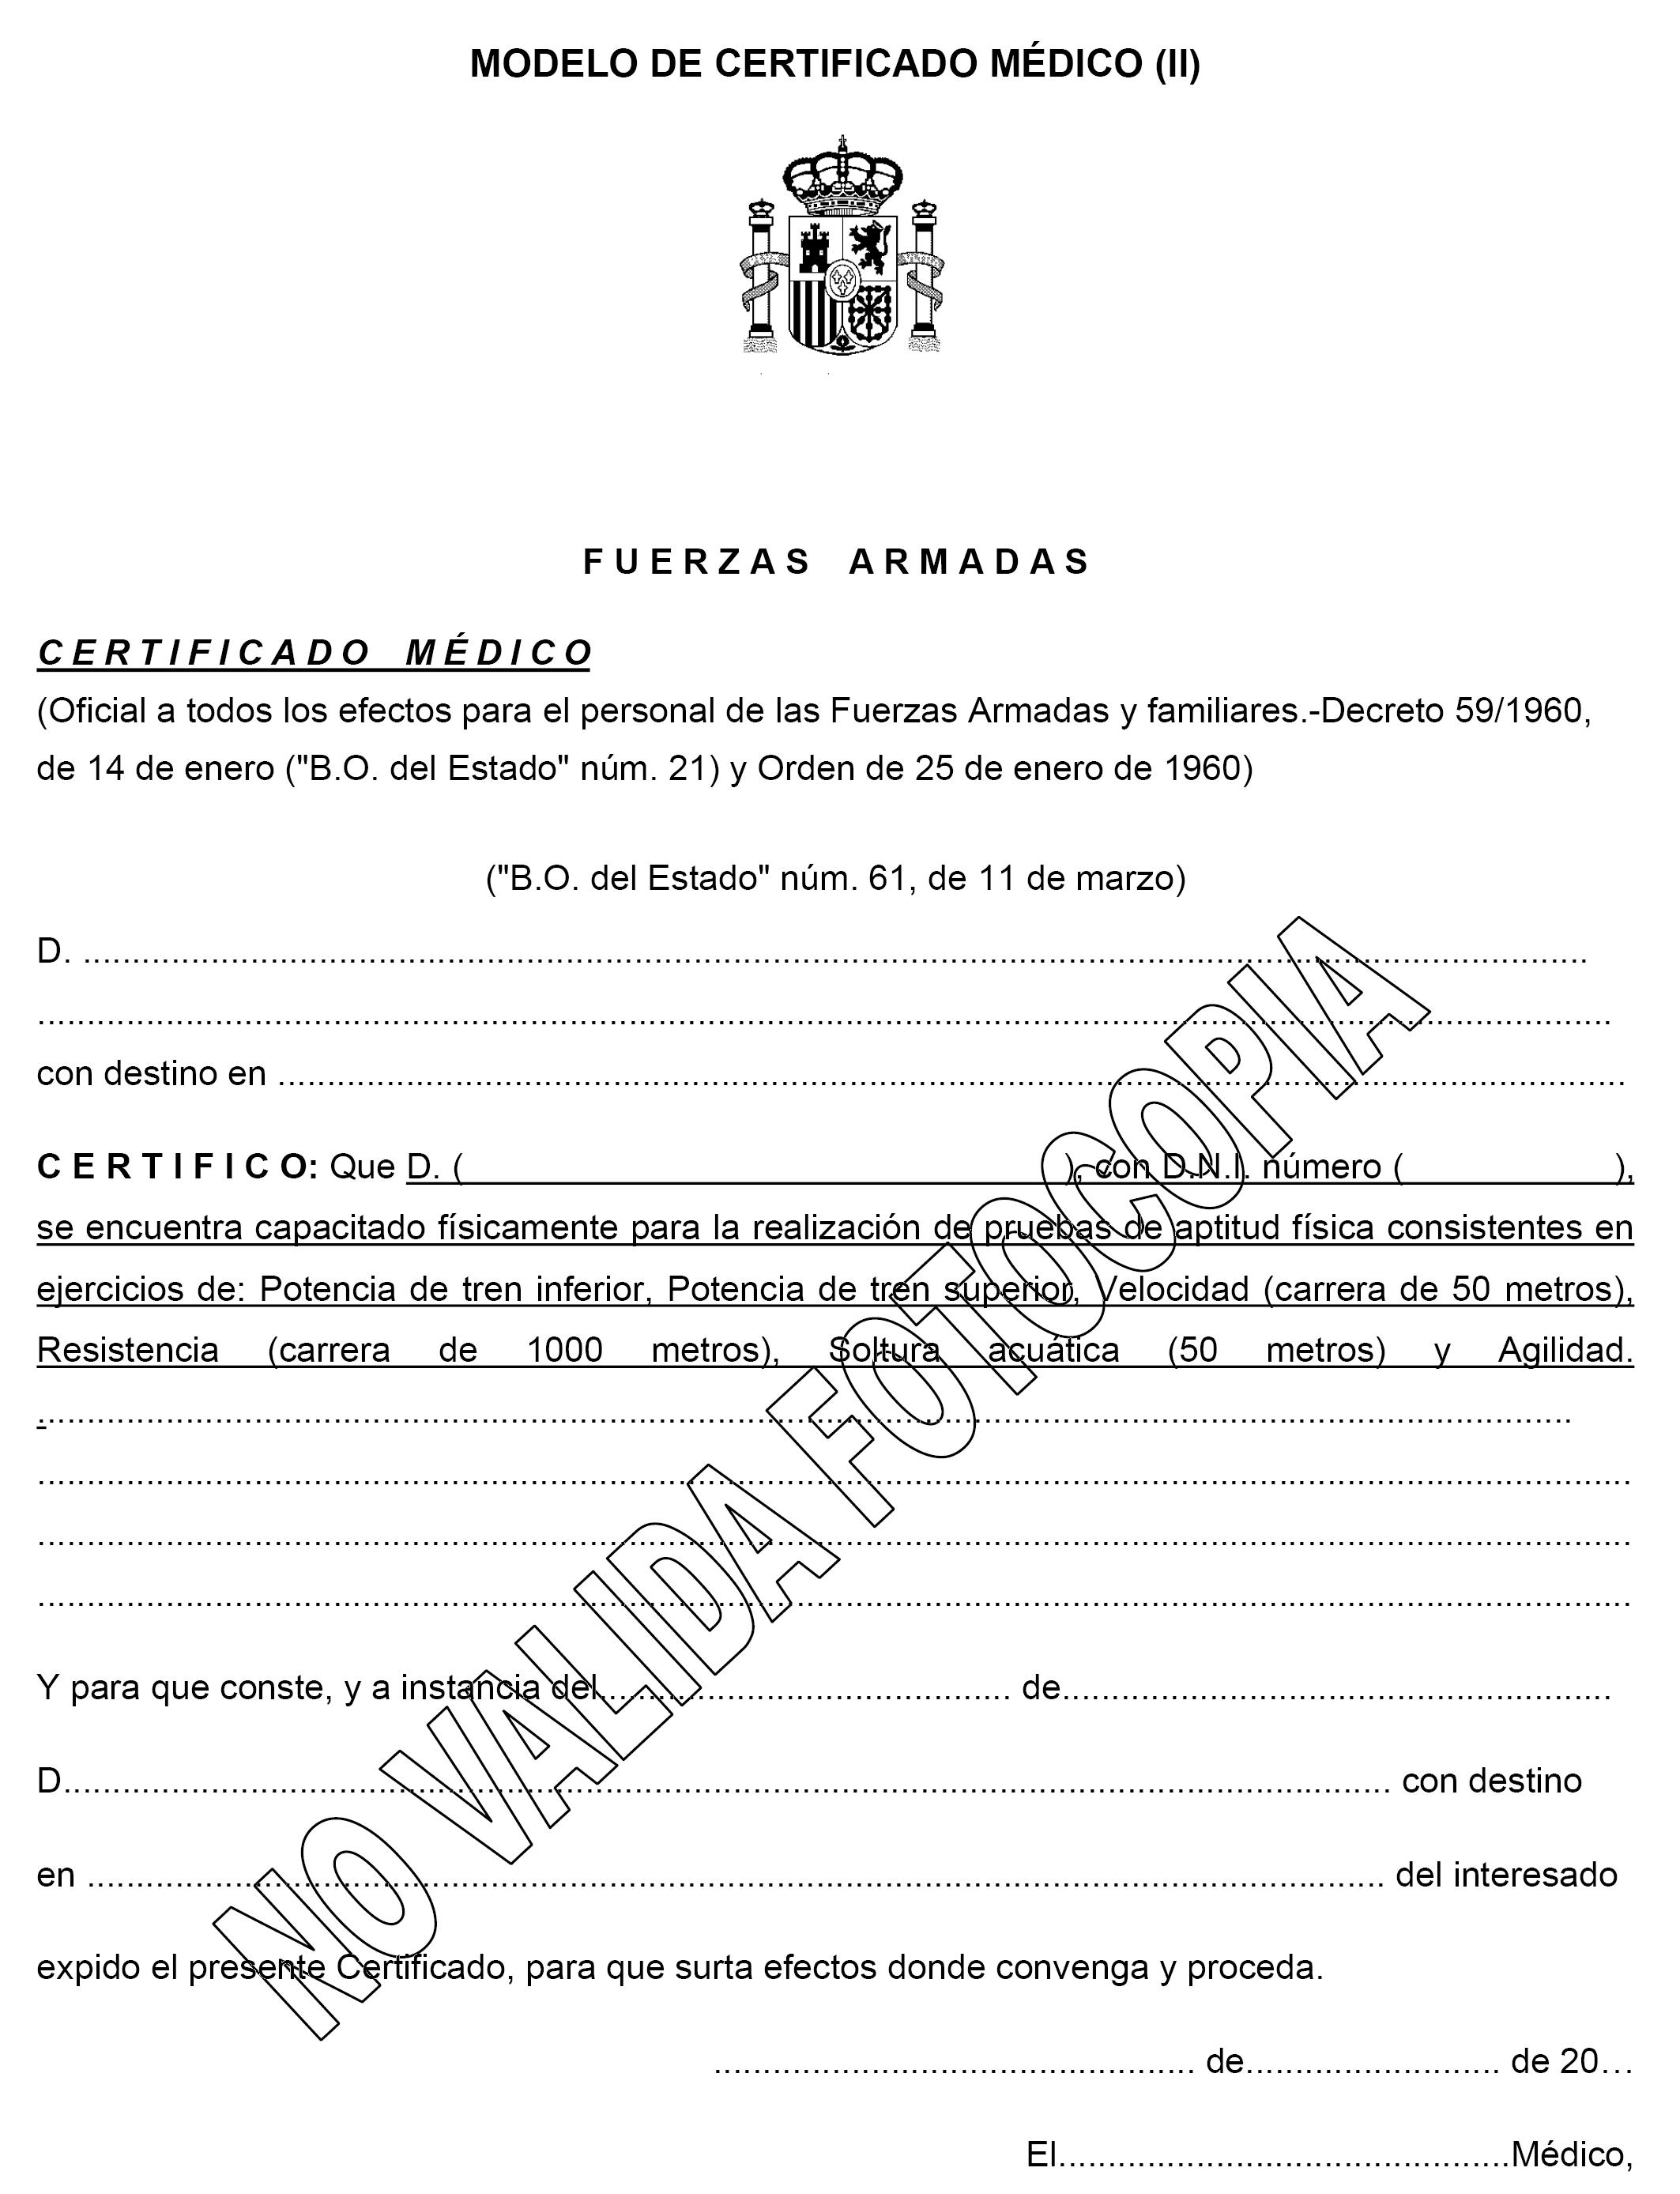 BOE.es - Documento BOE-A-2017-5918